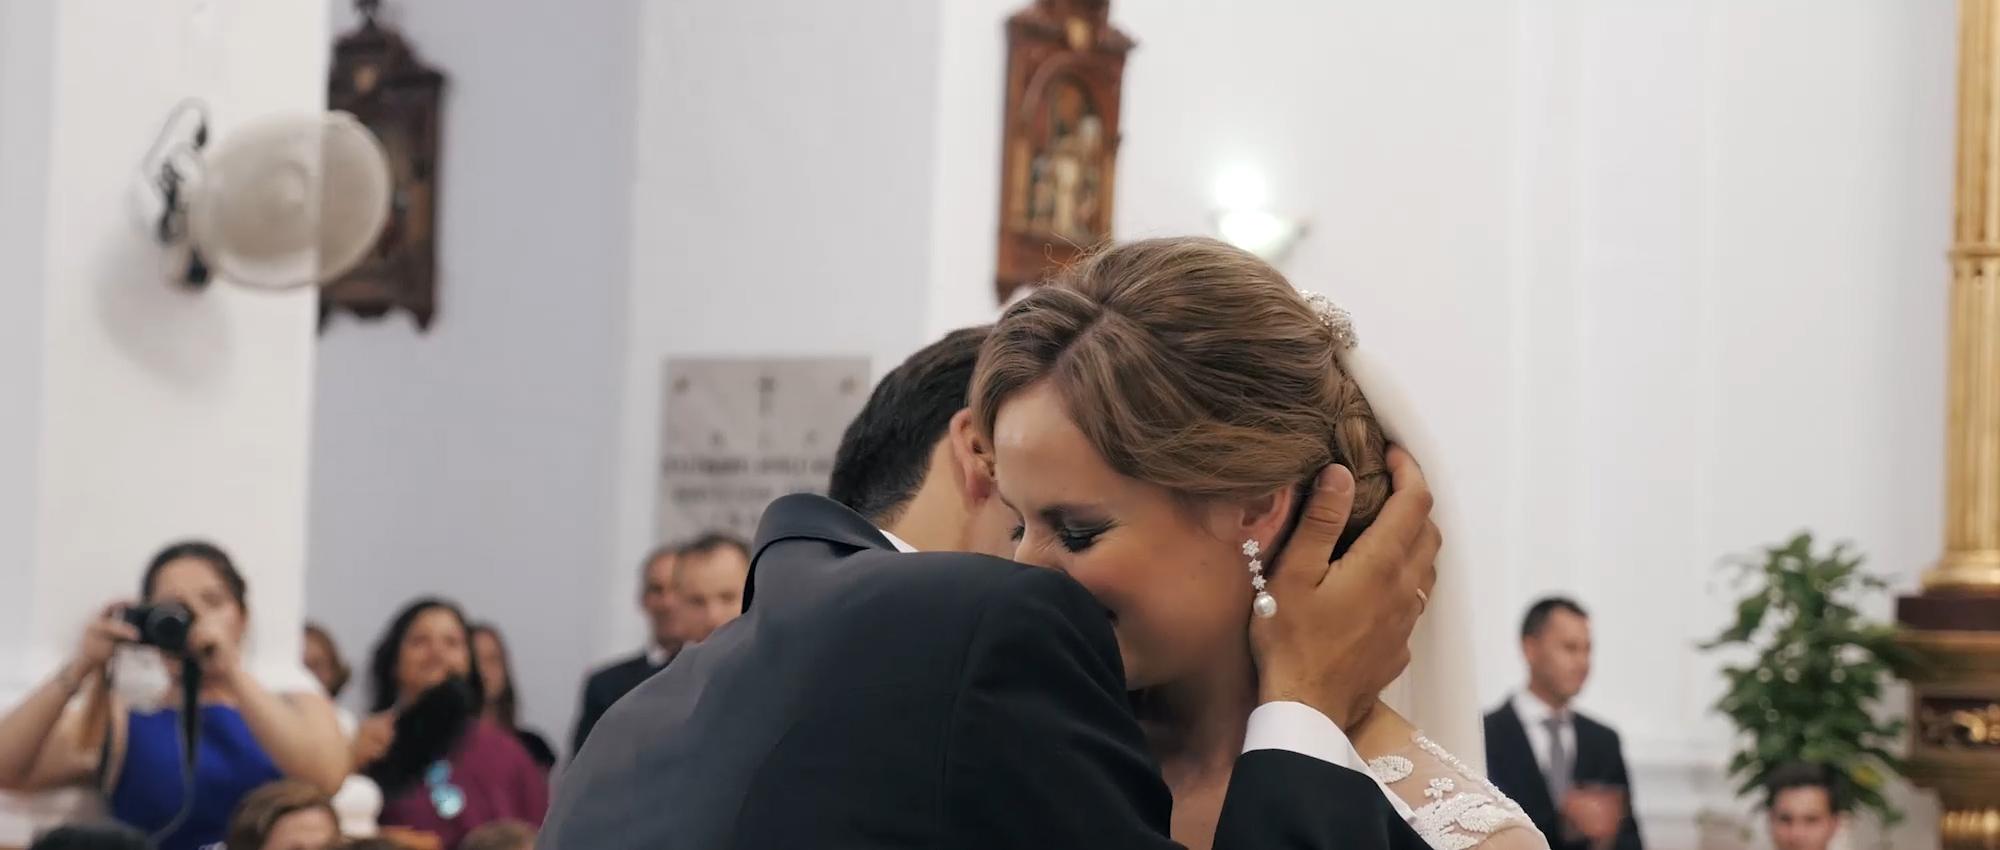 novia, qmirar, Alhaurin el Grande, video, canta, altar, boda